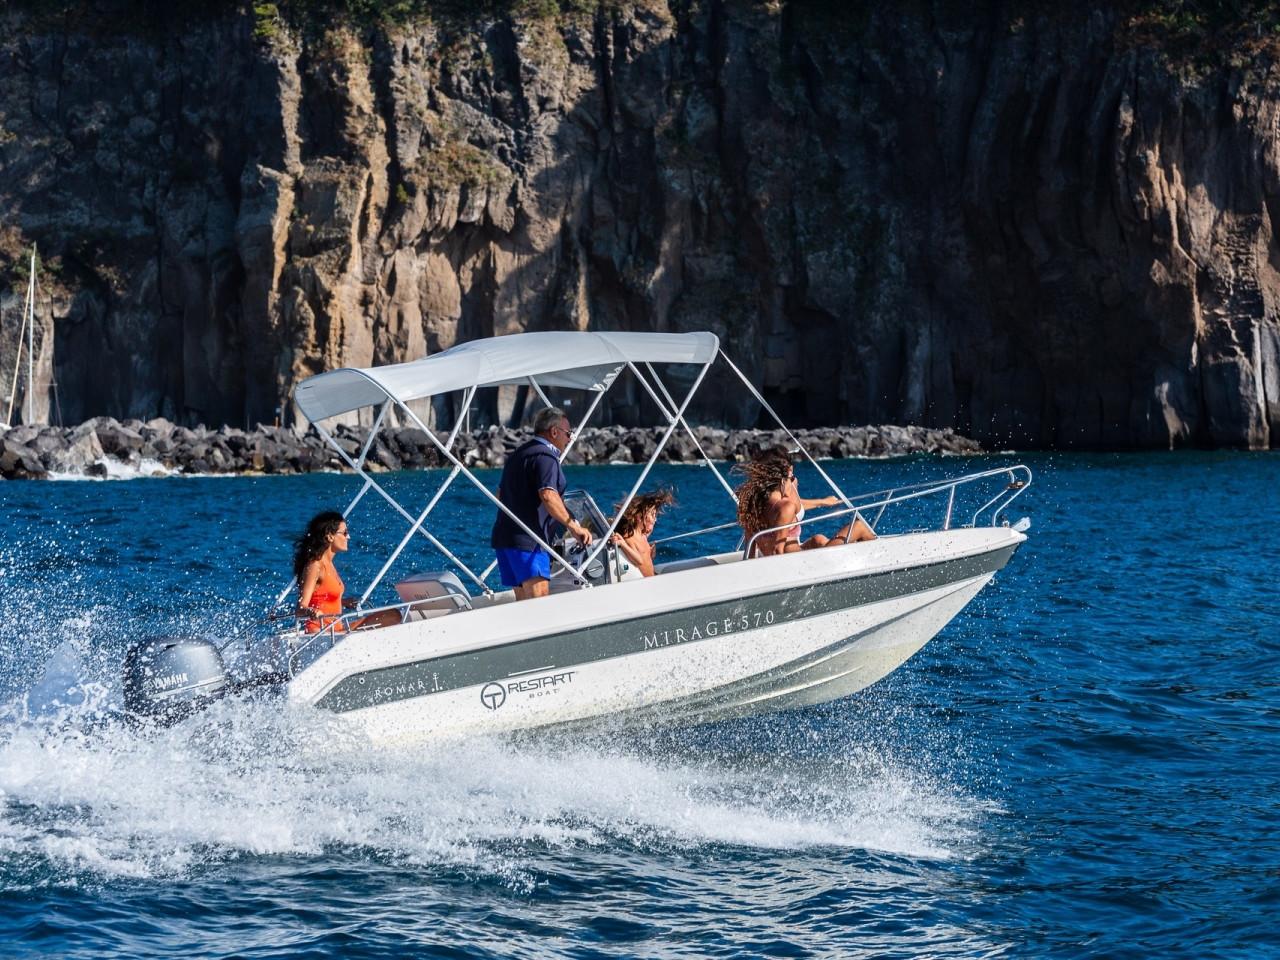 ROMAR MIRAGE 570   Mar Amar Sorrento boat tour